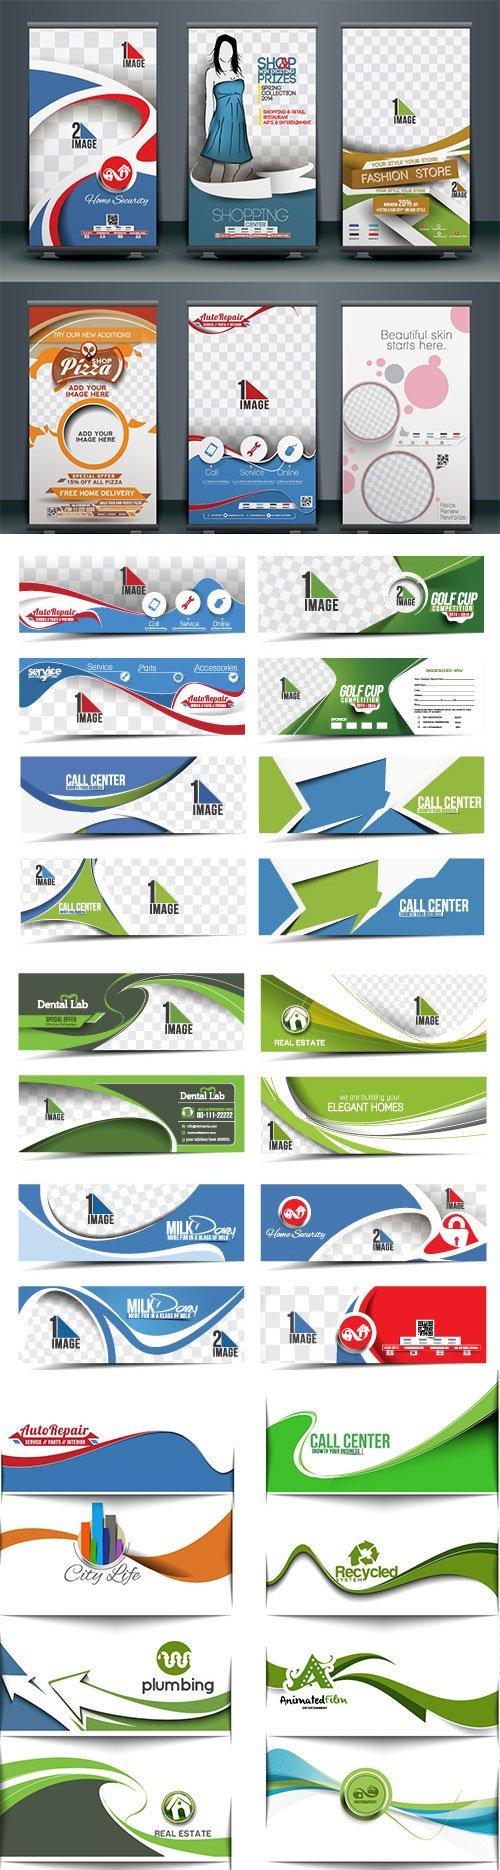 Modern horizontal banner and header template